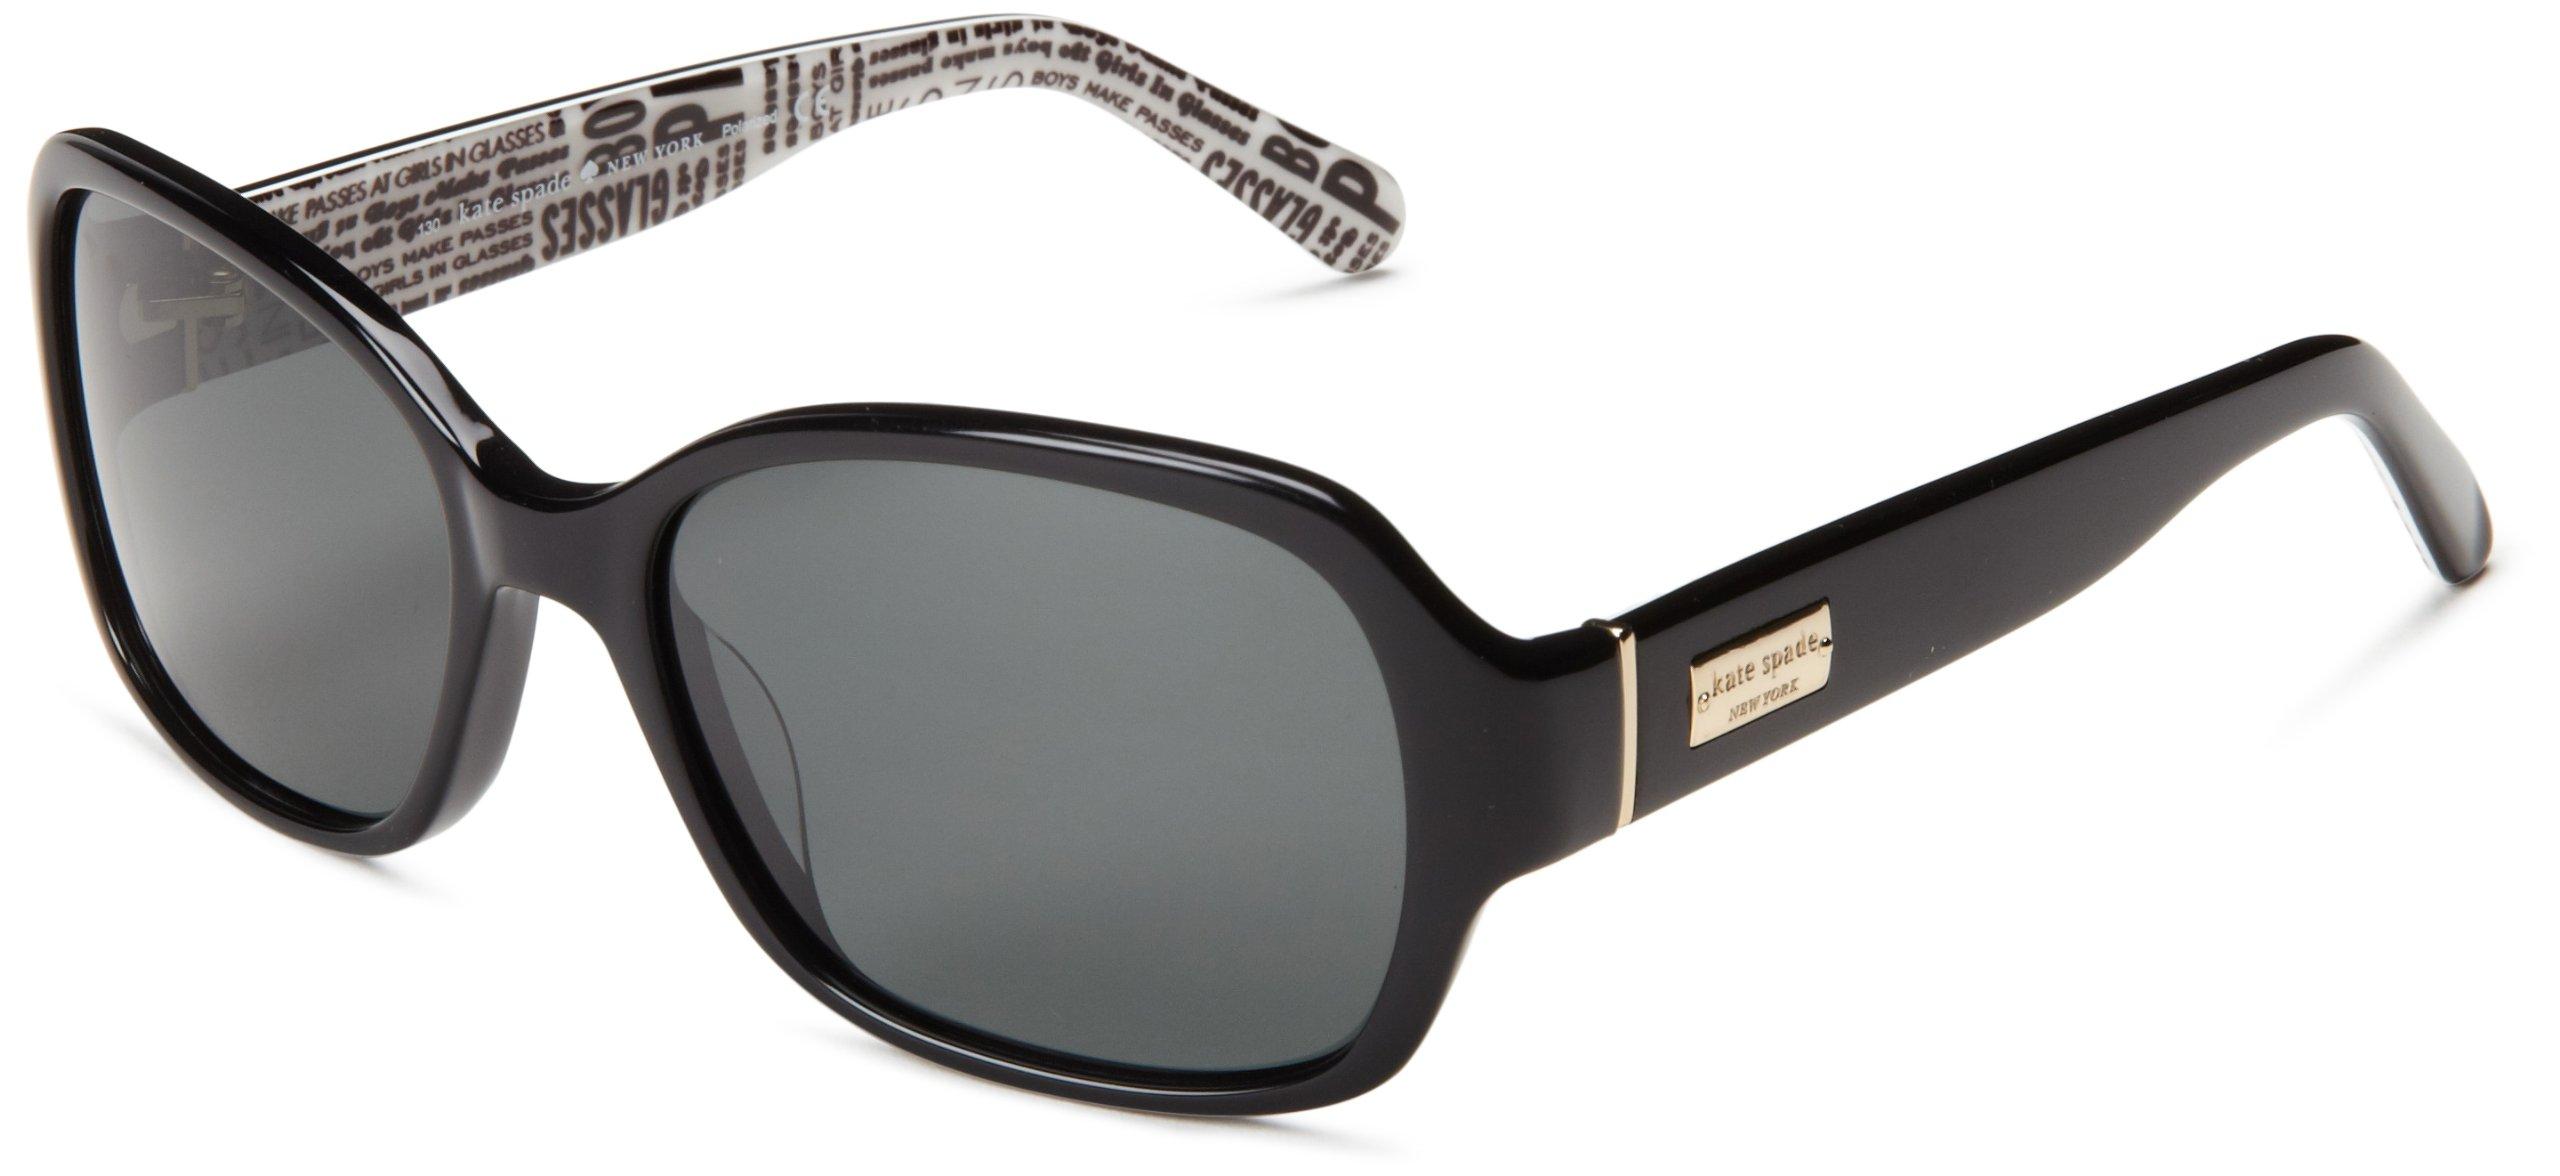 Kate Spade Women's Akira Polarized Rectangular Sunglasses,Black,54 mm